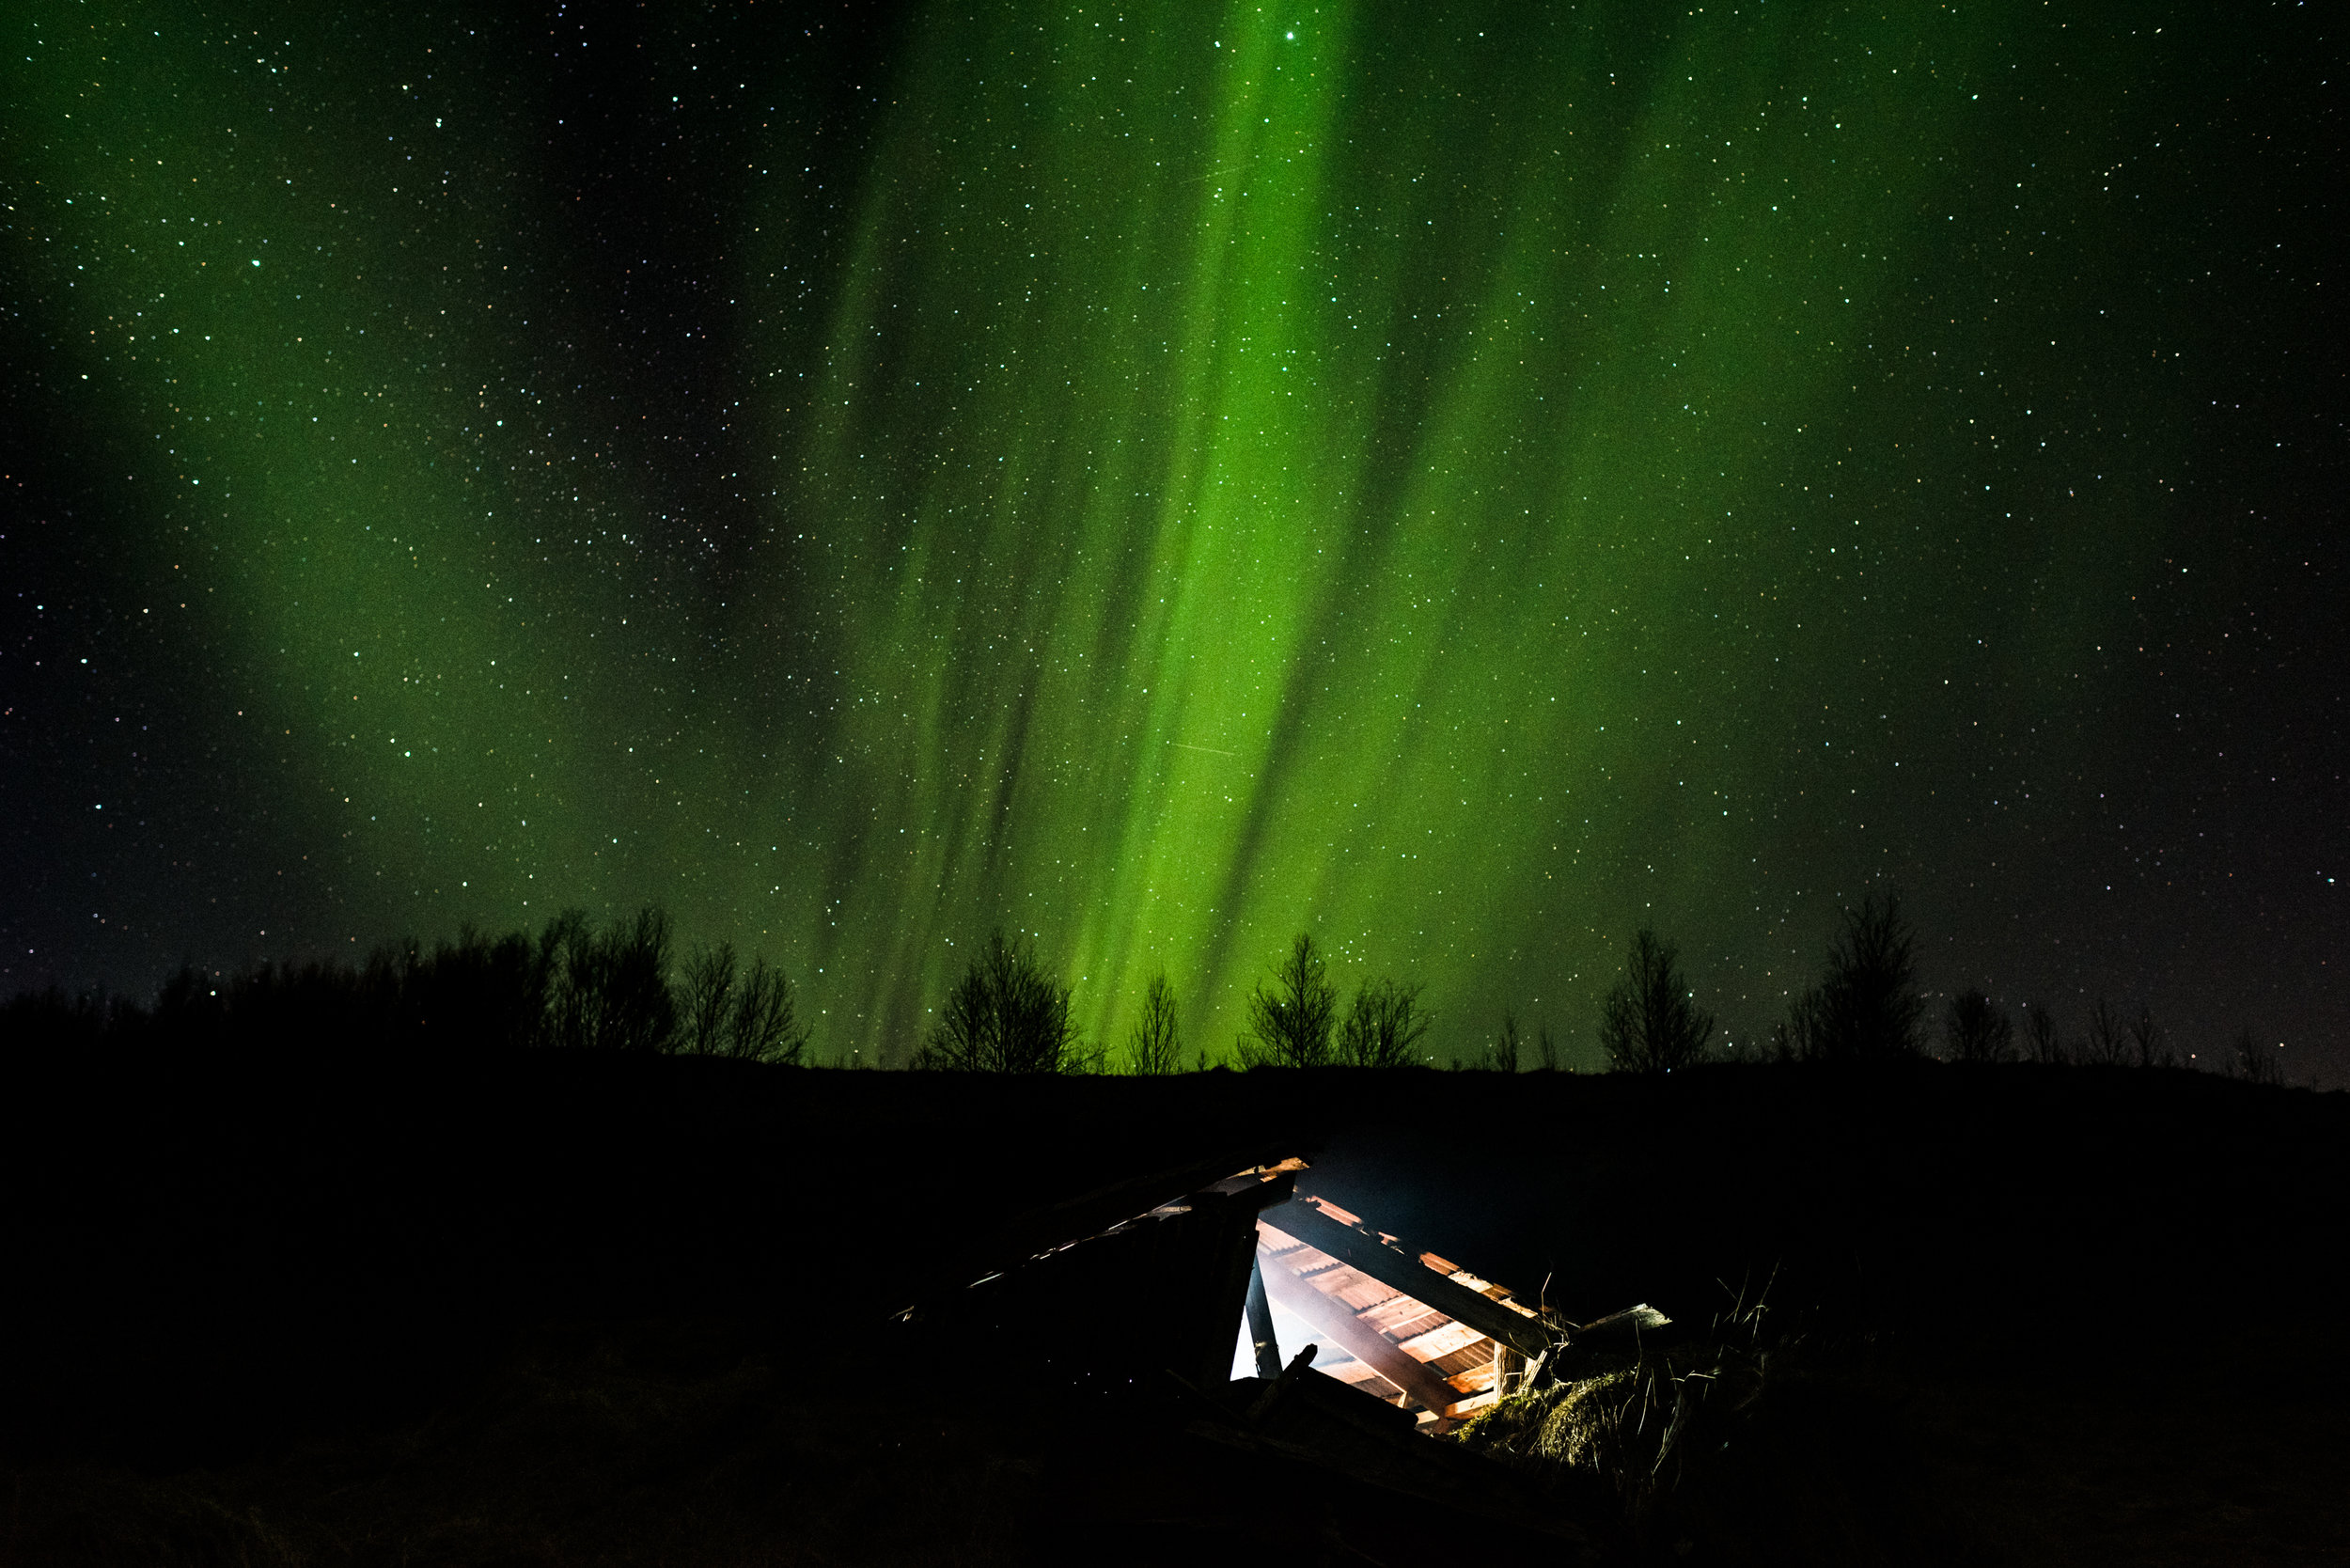 Iceland_TaraShupe_Photography_DSC_6183.jpg